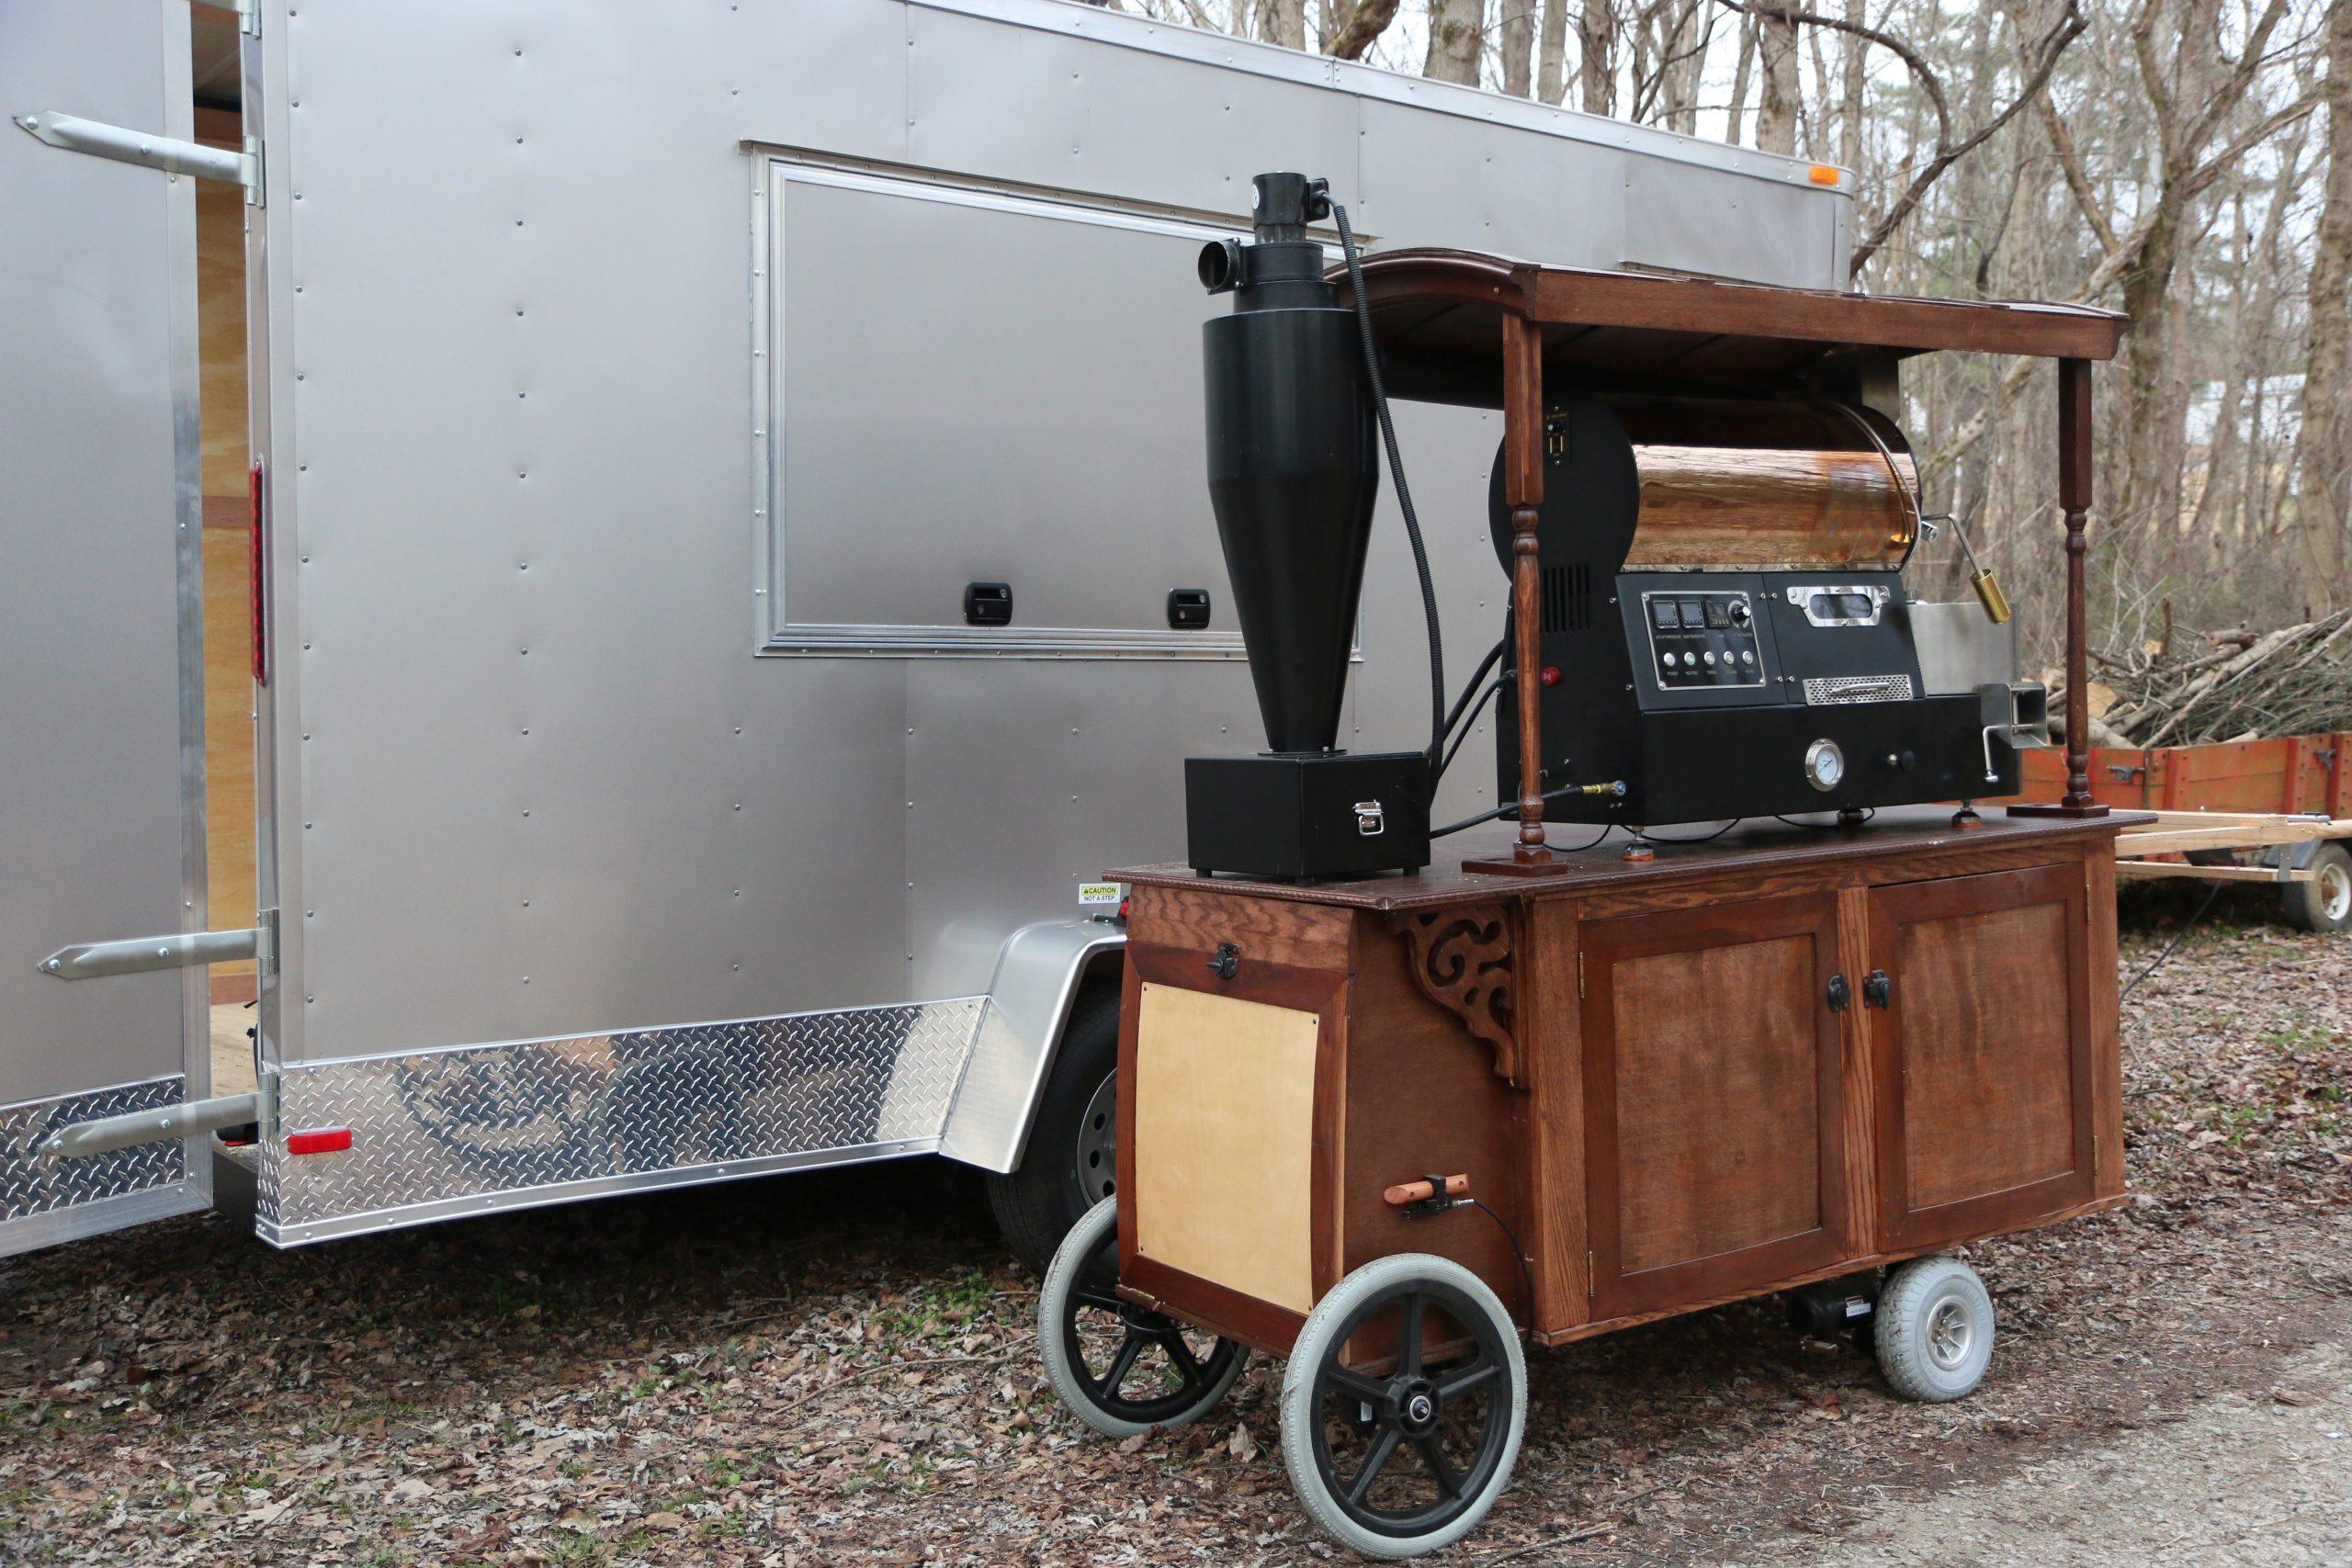 2 kilo coffee roaster on motorized cart